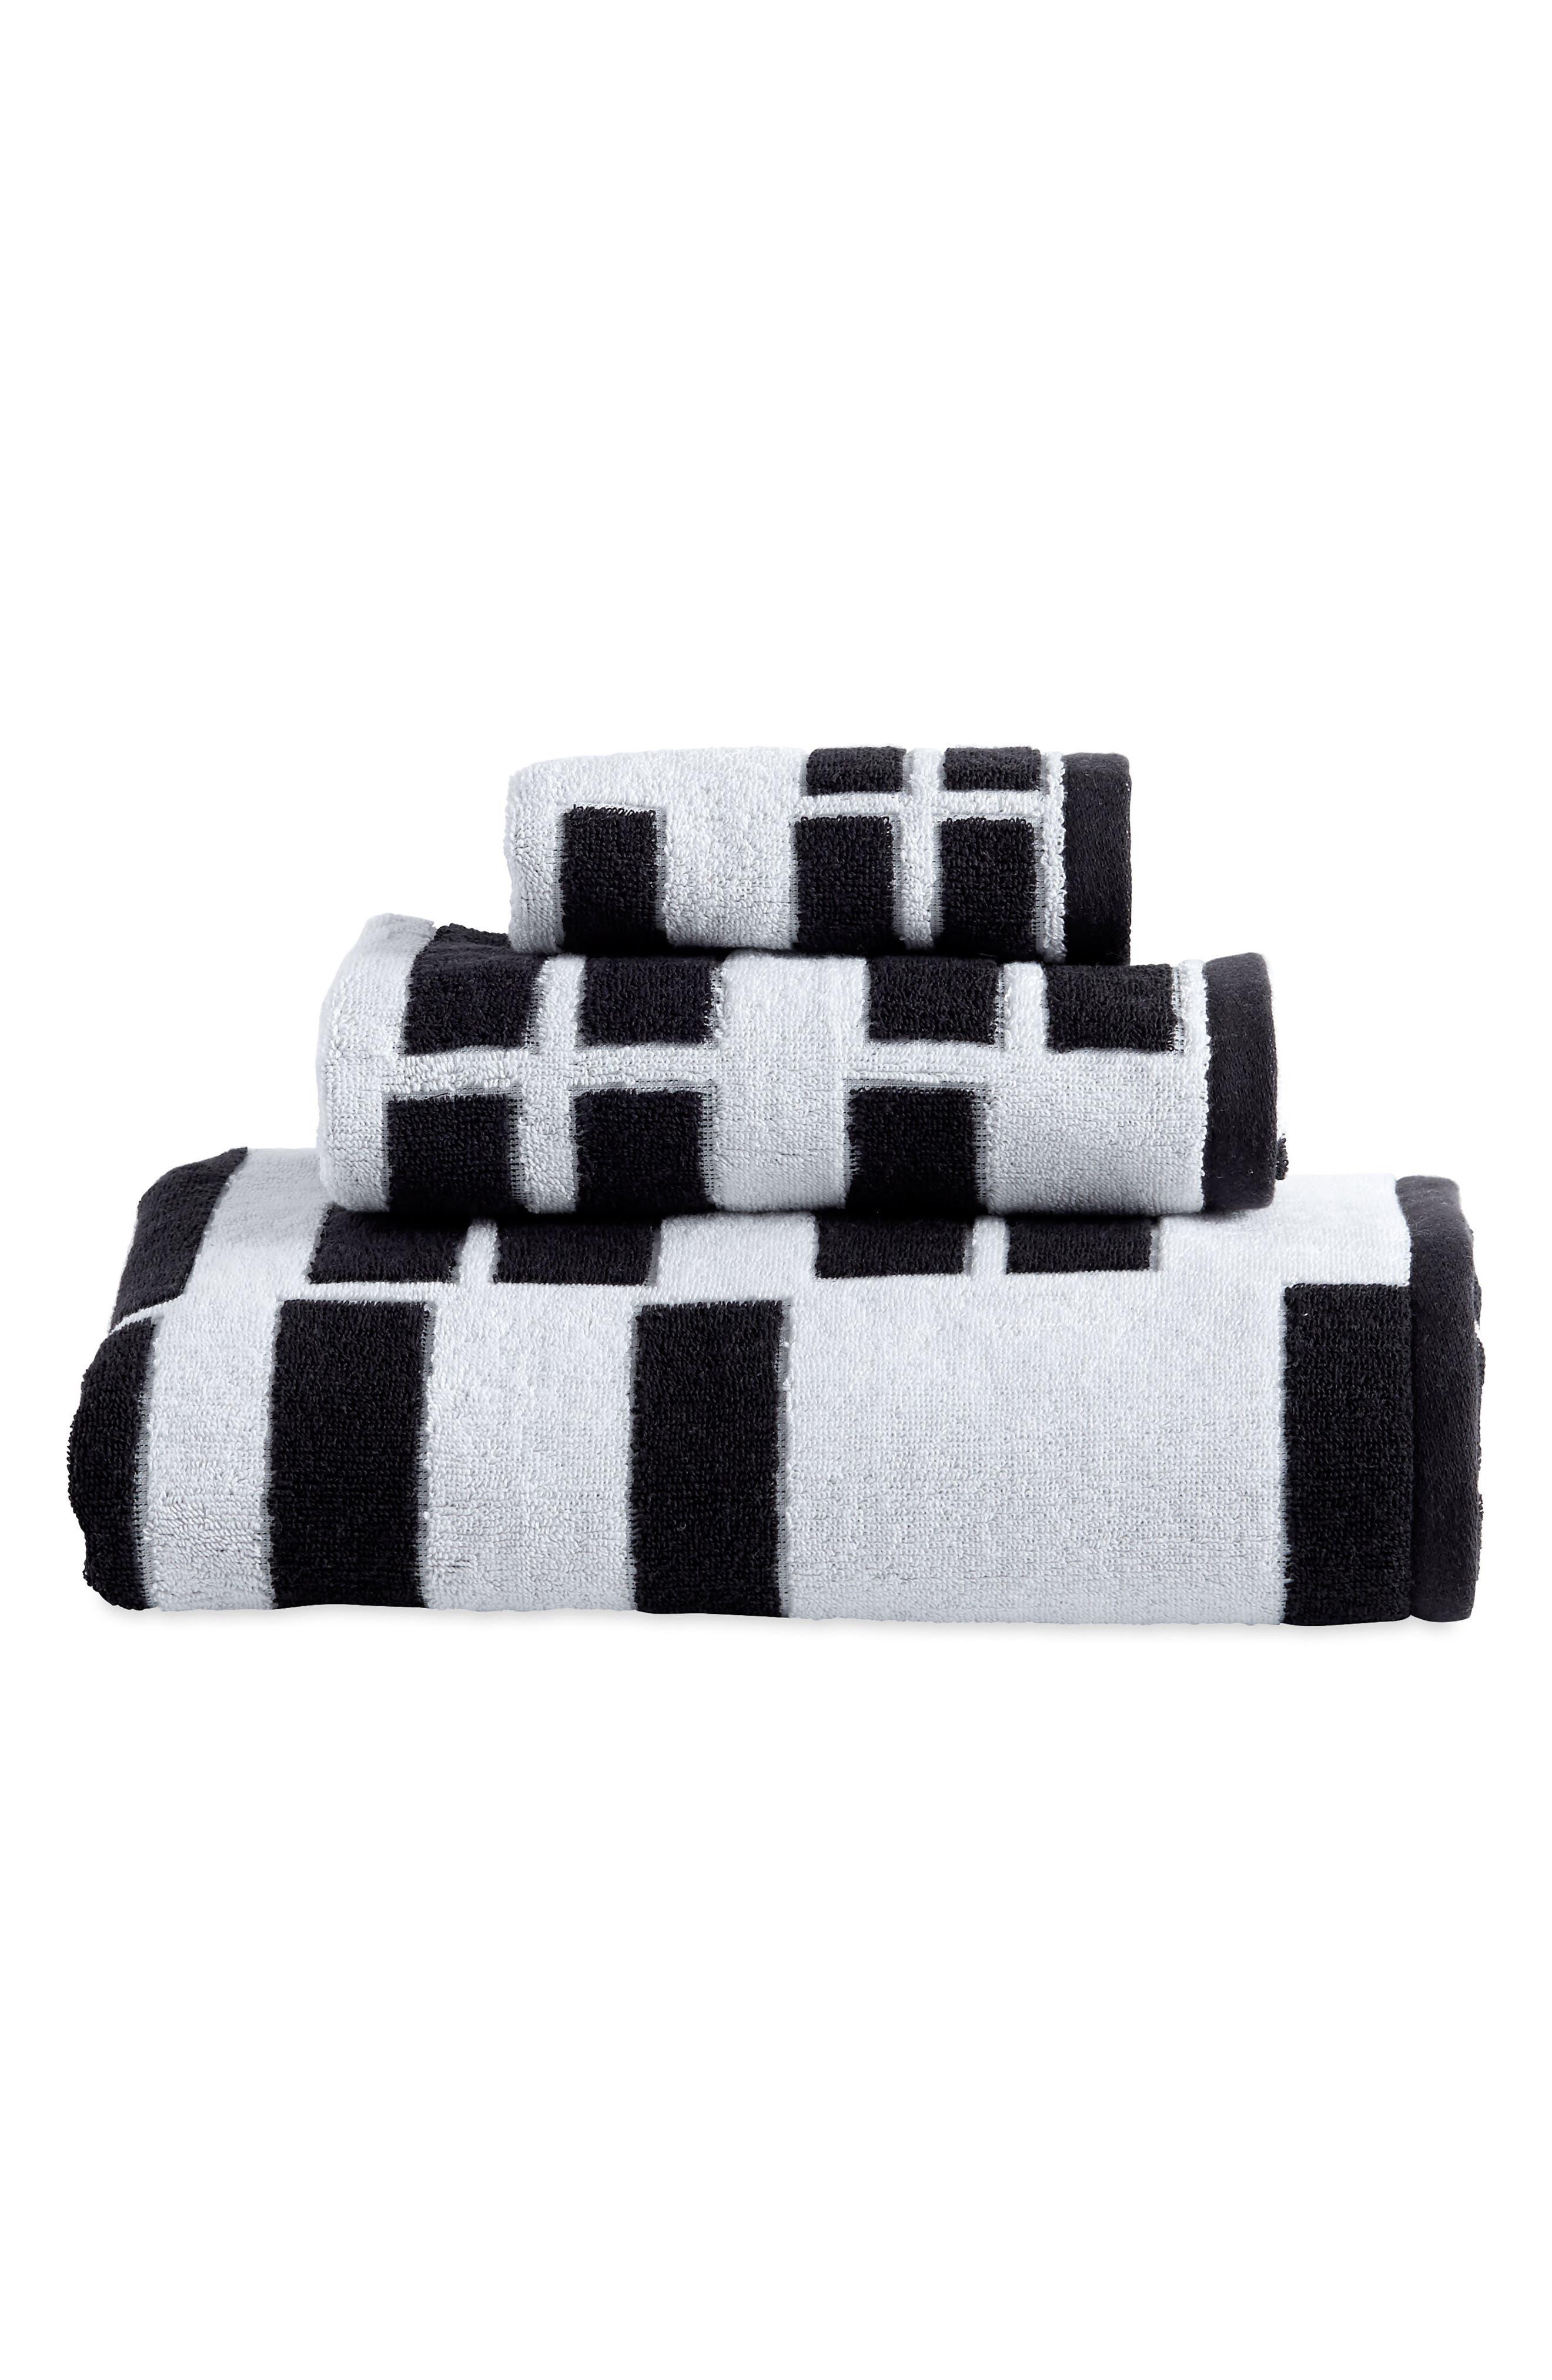 High Rise Fingertip Towel,                             Main thumbnail 1, color,                             001